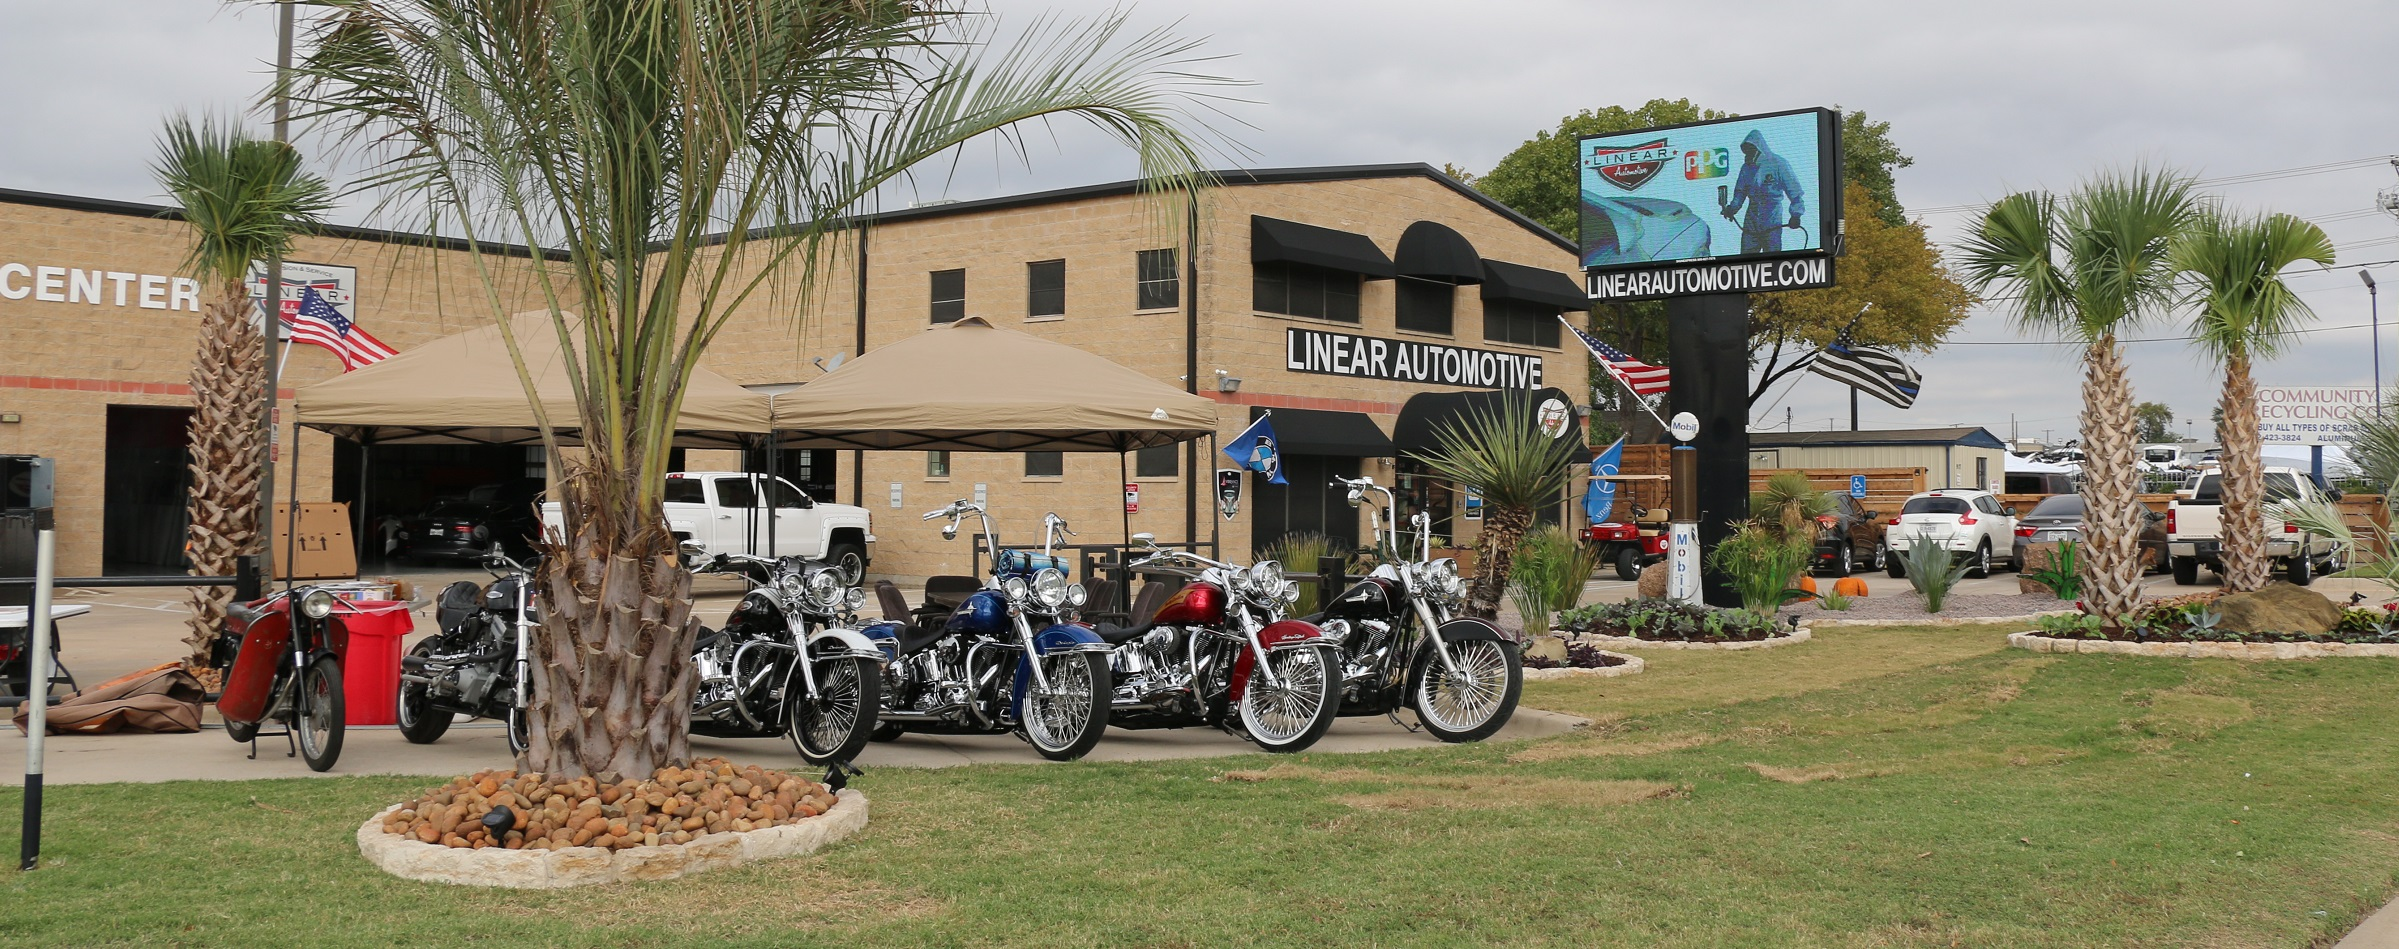 Best Custom Motorcycle Painter in Dallas Fort Worth Plano Richardson Allen McKinney Texas